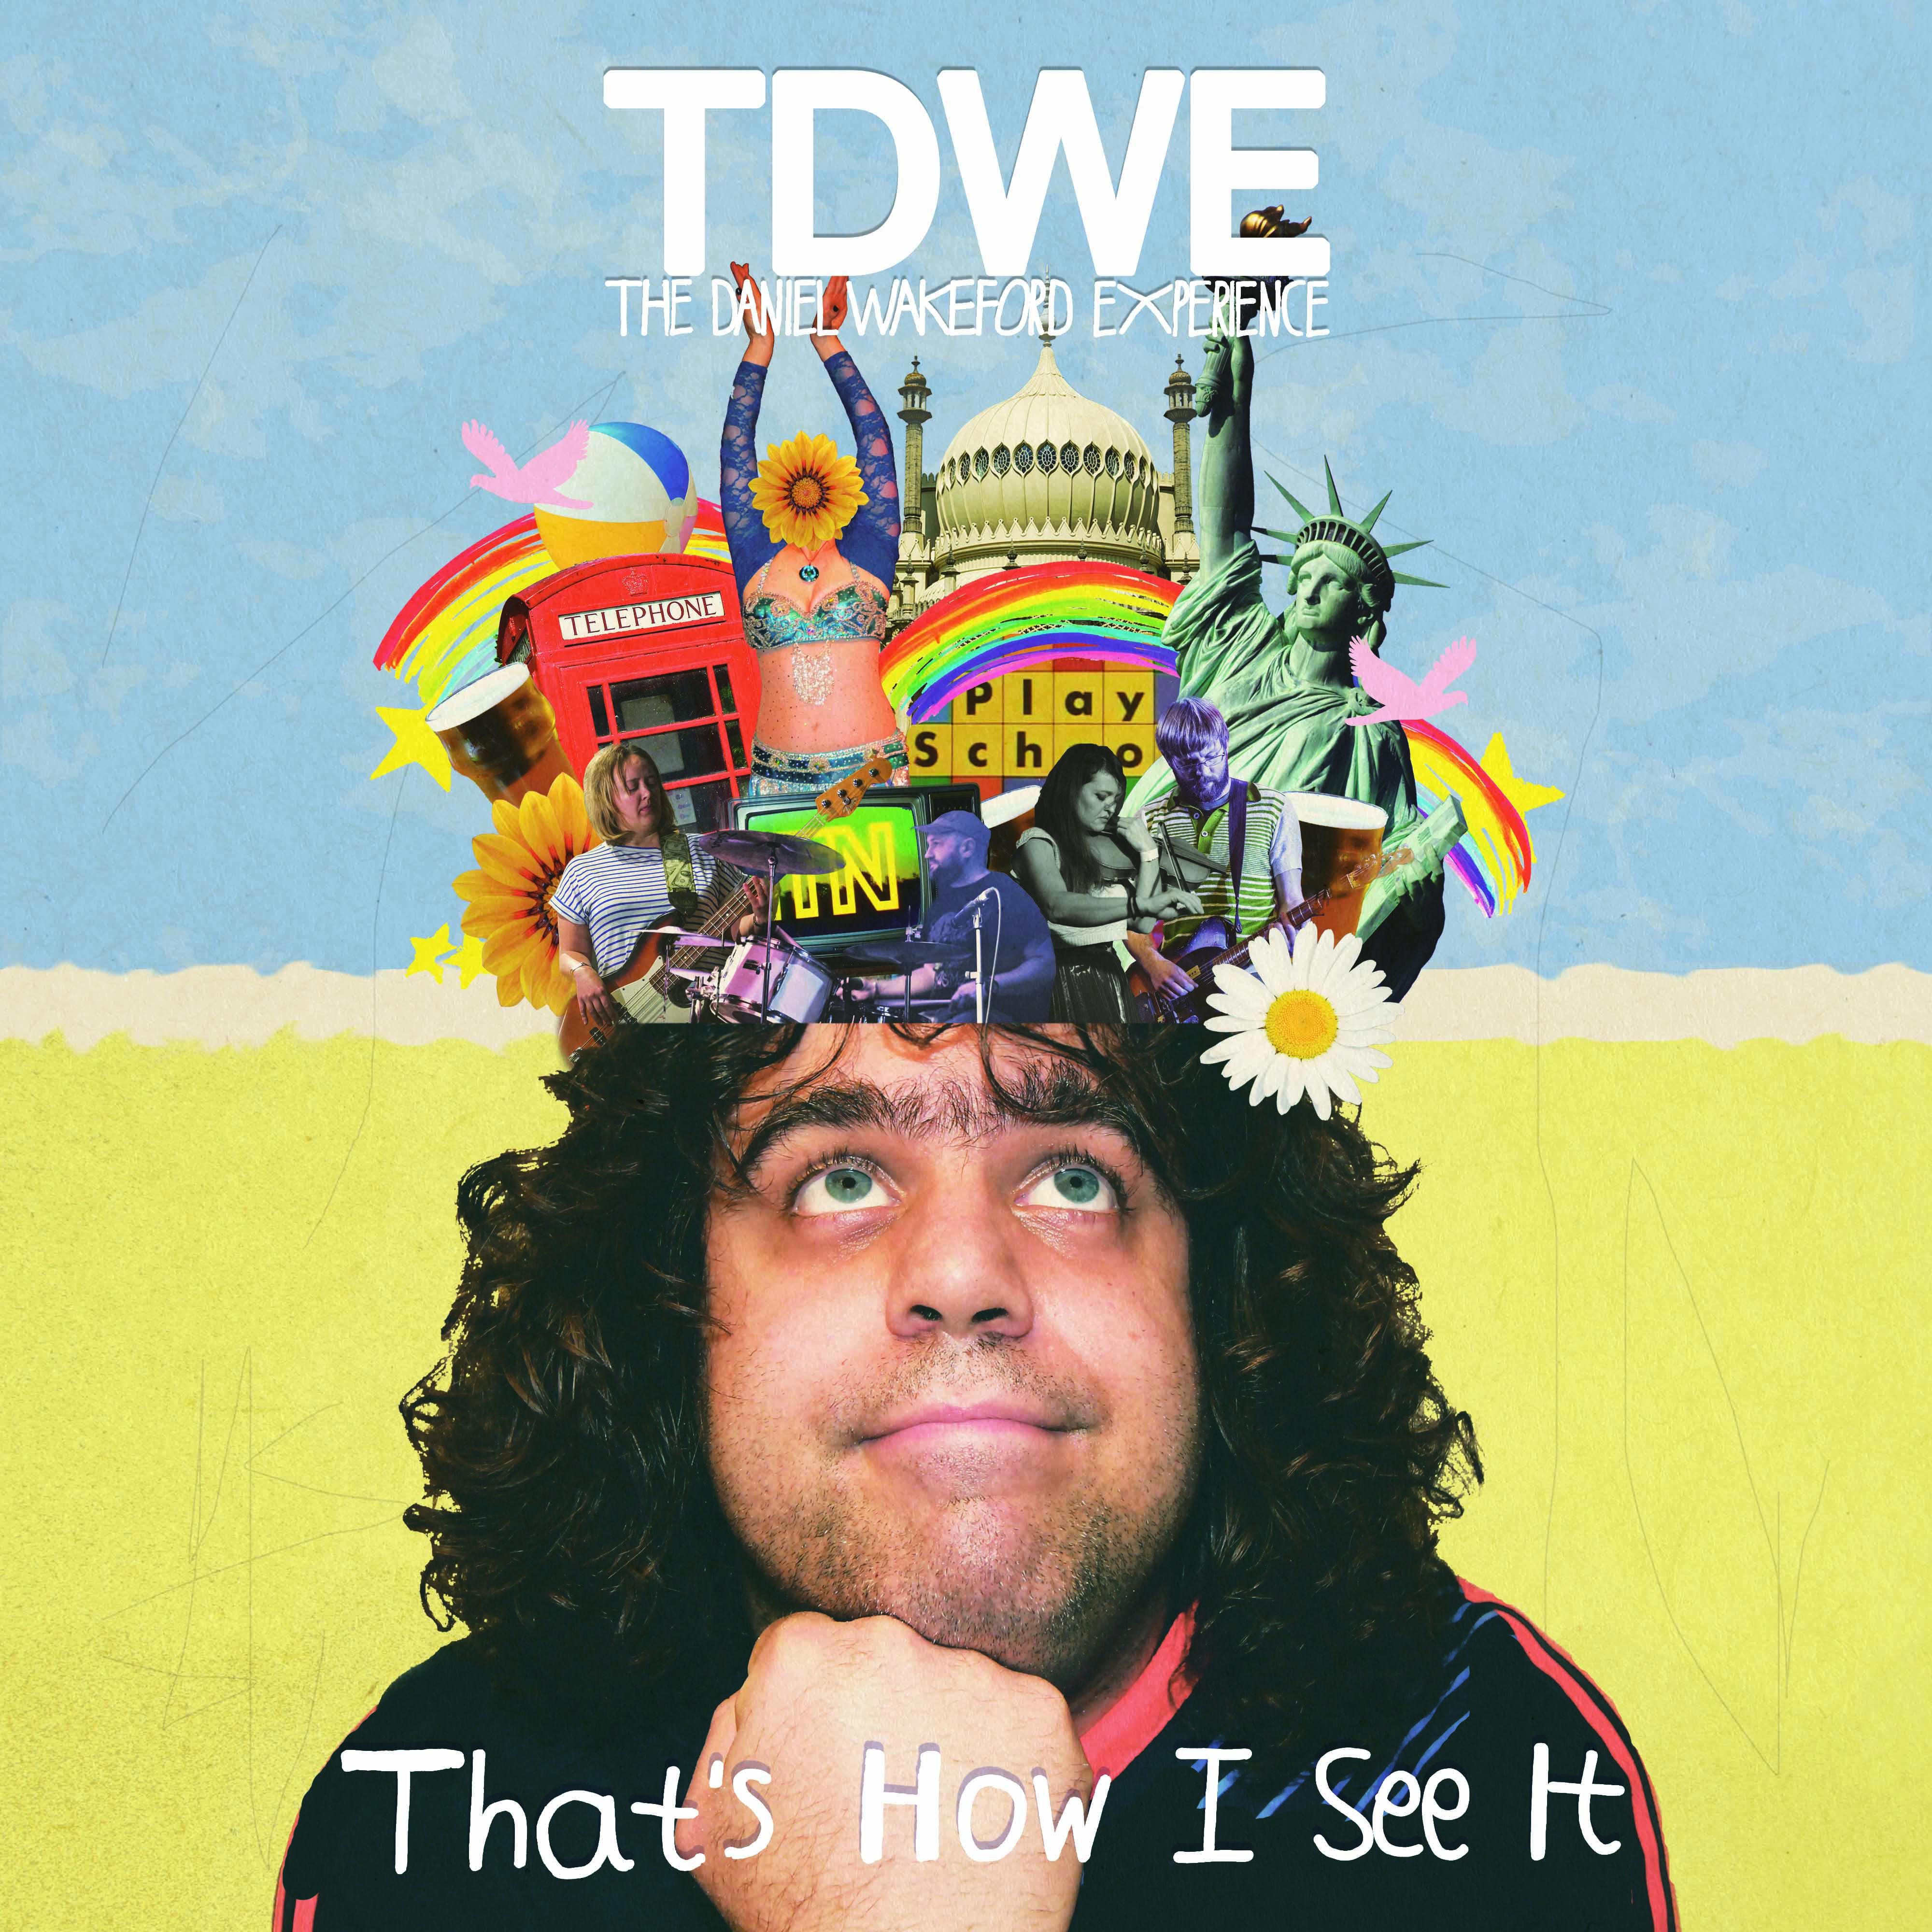 THAT'S HOW I SEE IT - CD + T shirt - Daniel Wakeford